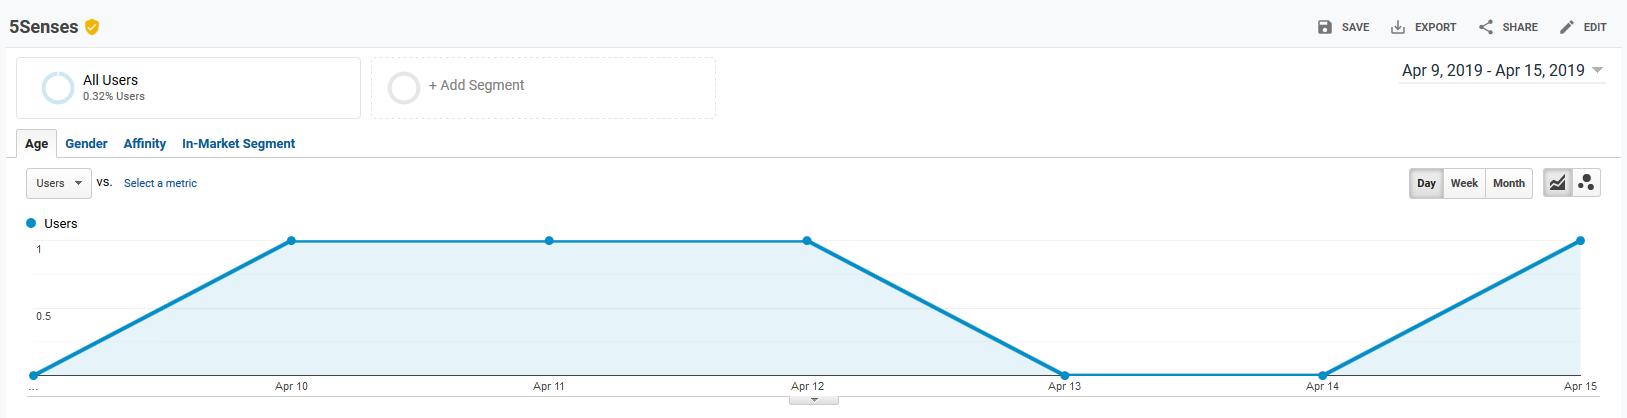 measure tracking URLs via Google Analytics